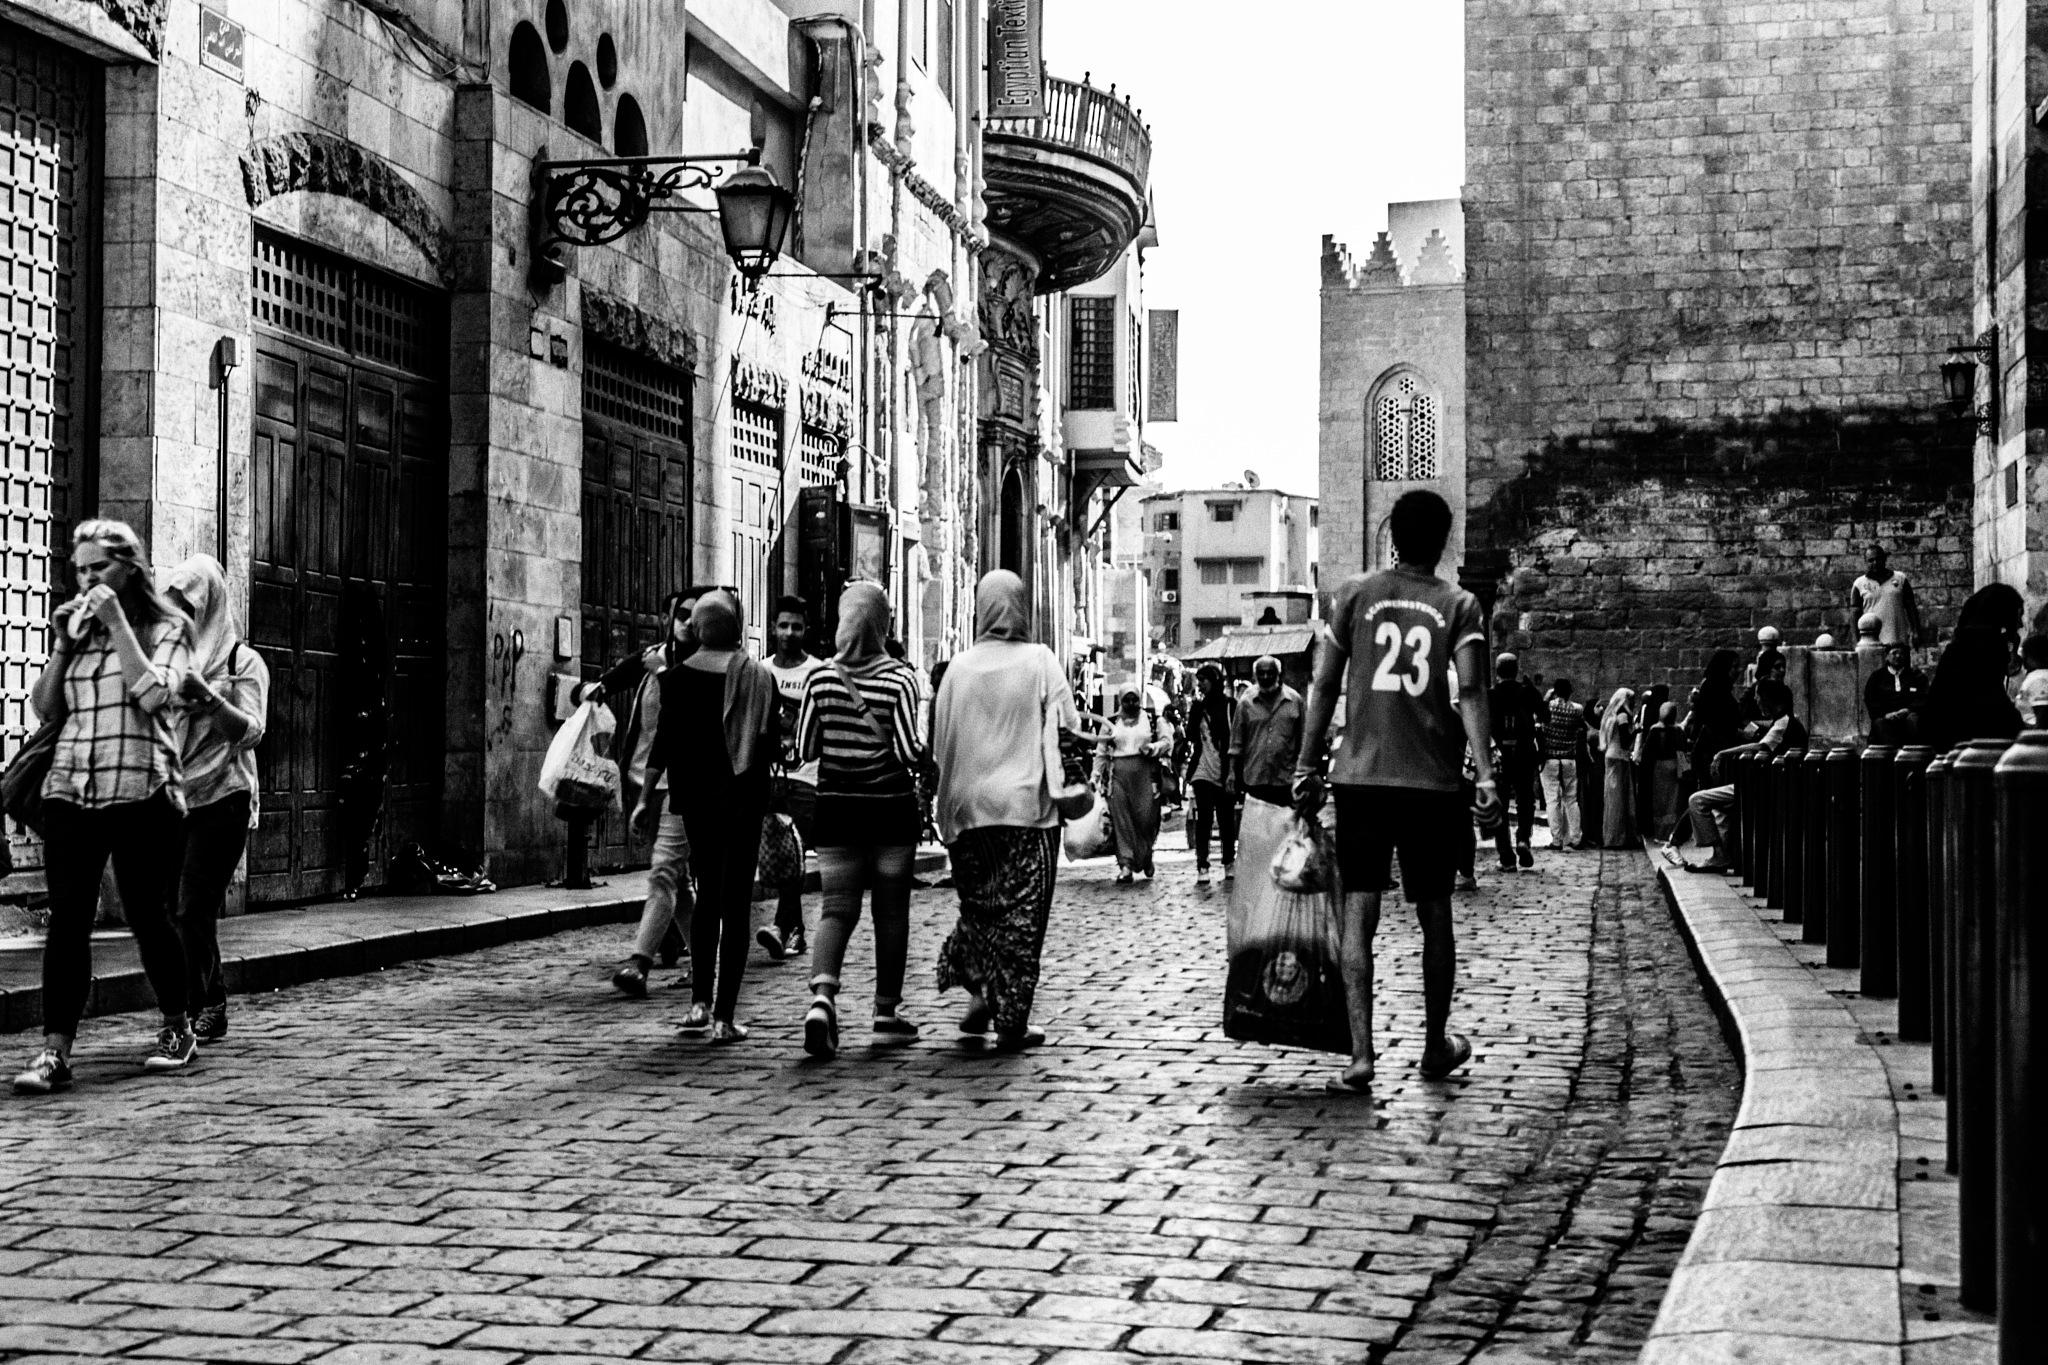 street 4 by Abdo Tahoon